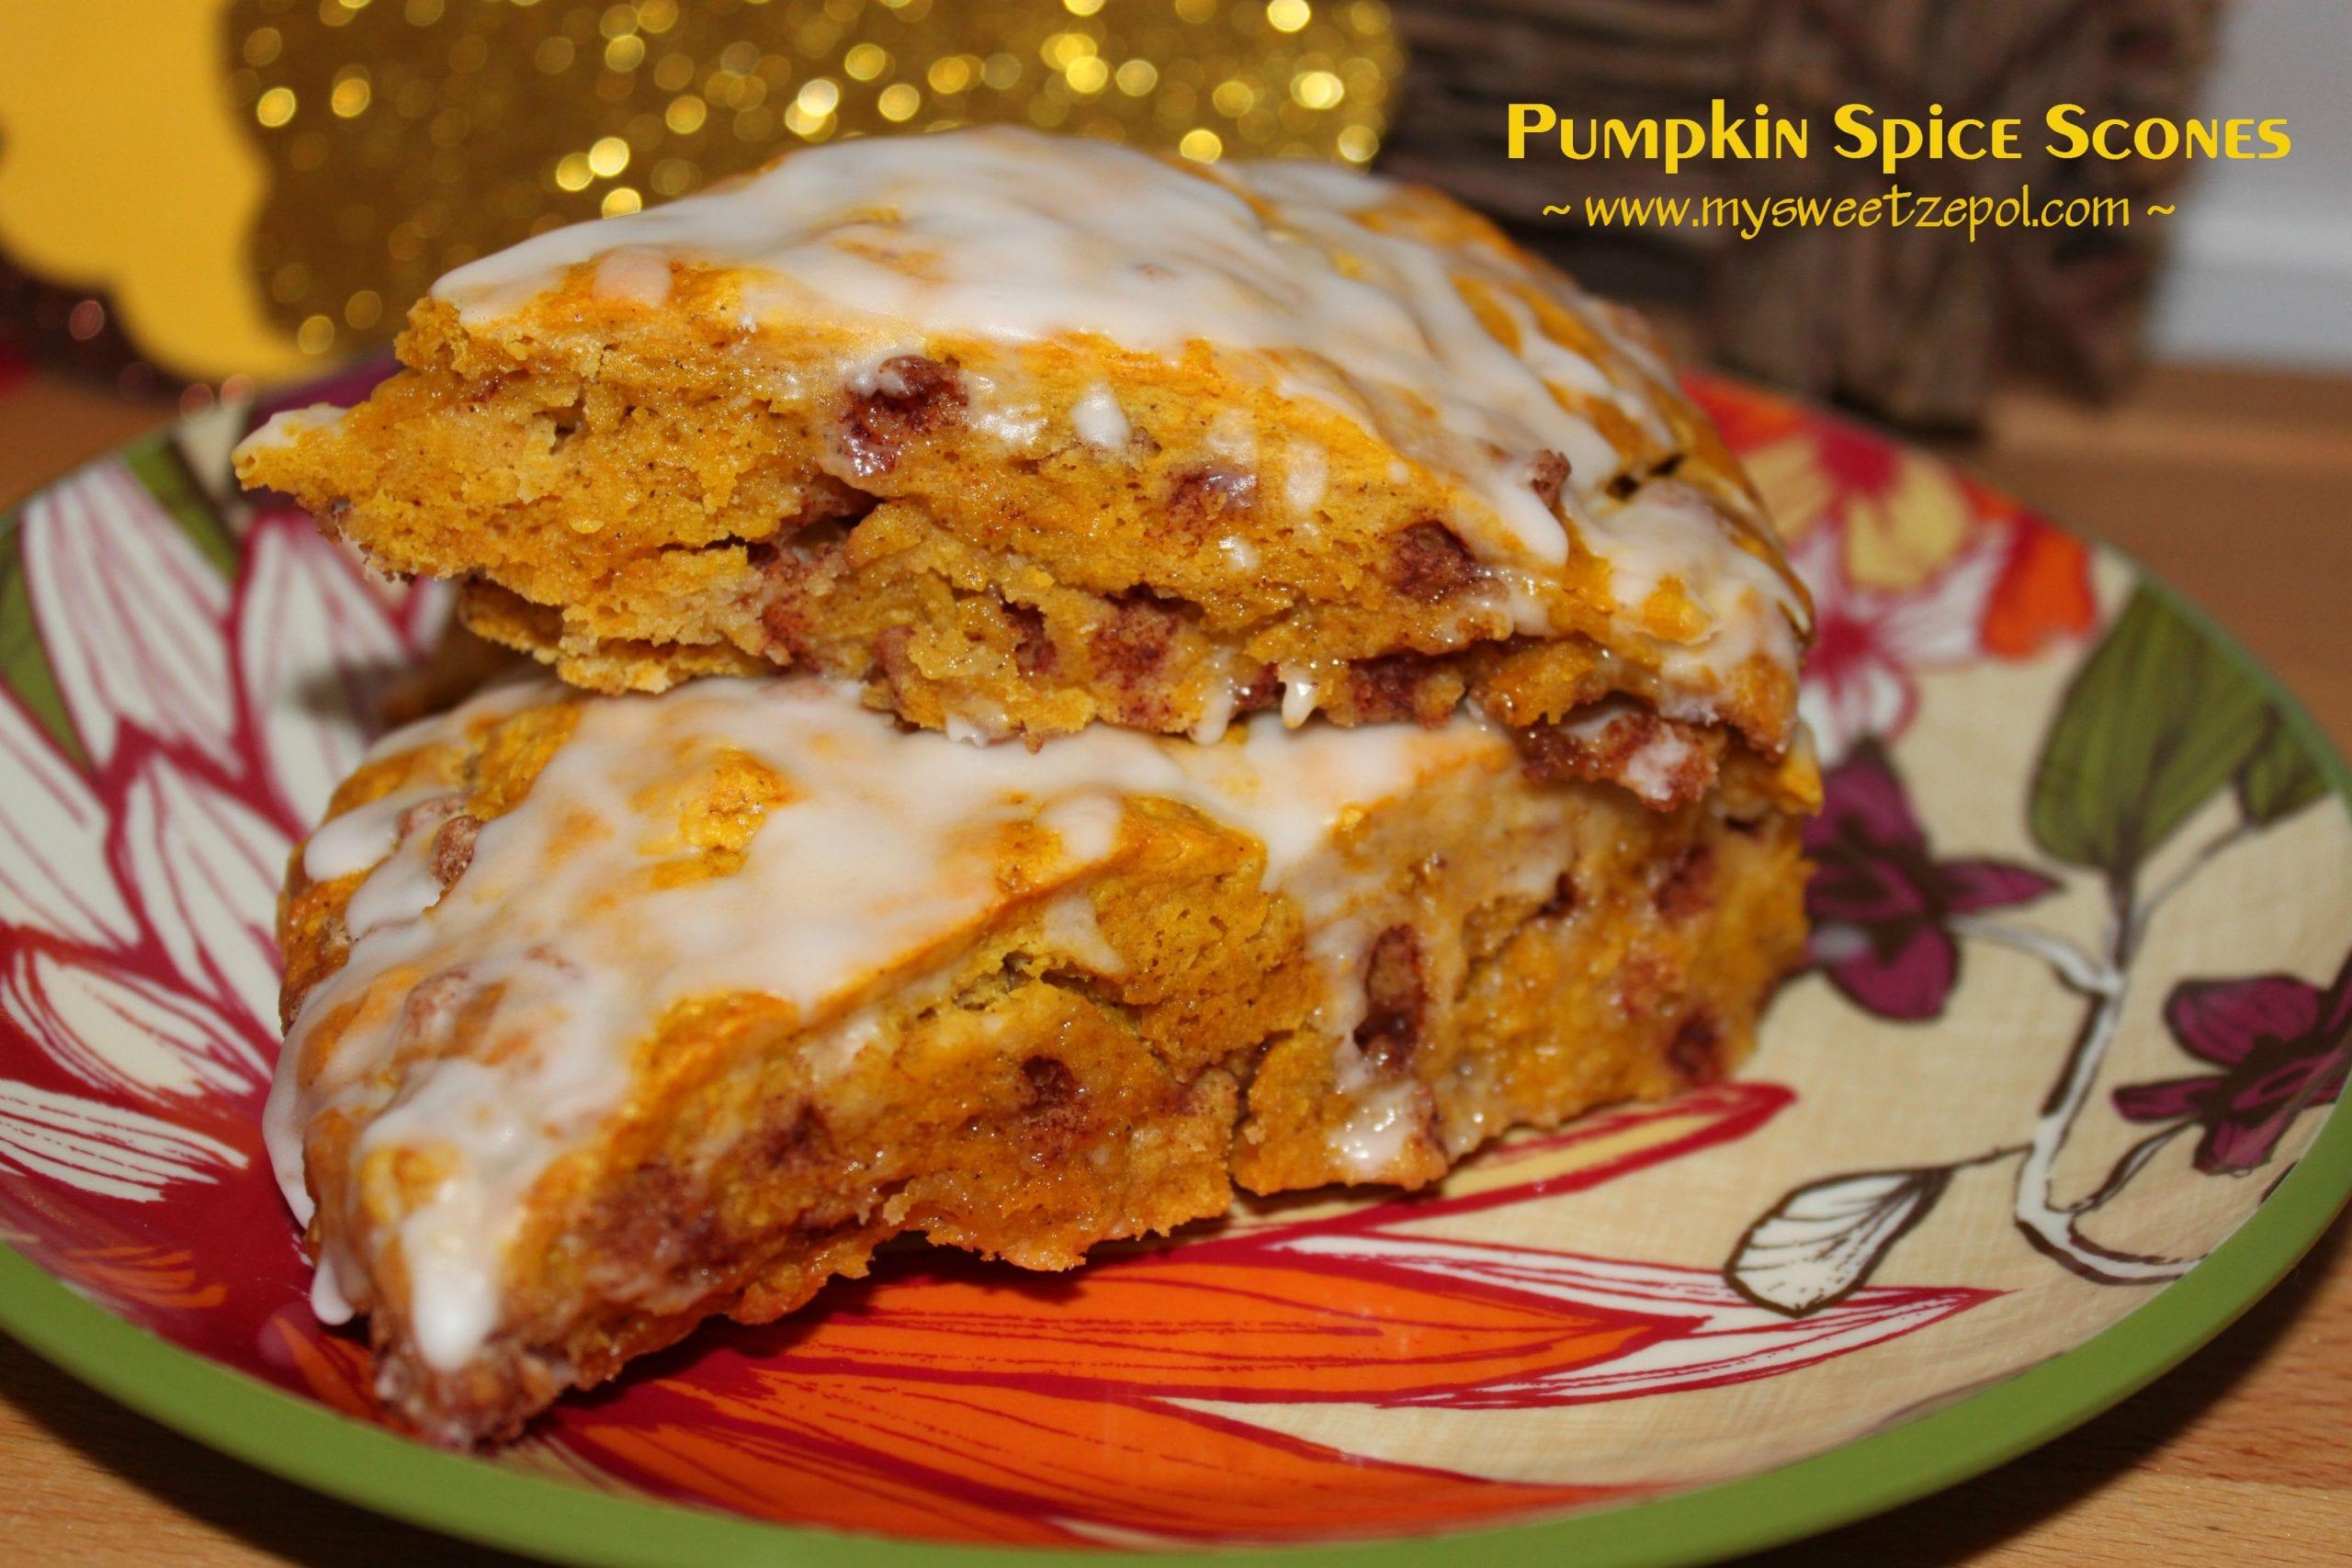 Pumpkin Spice Scones by mysweetzepol